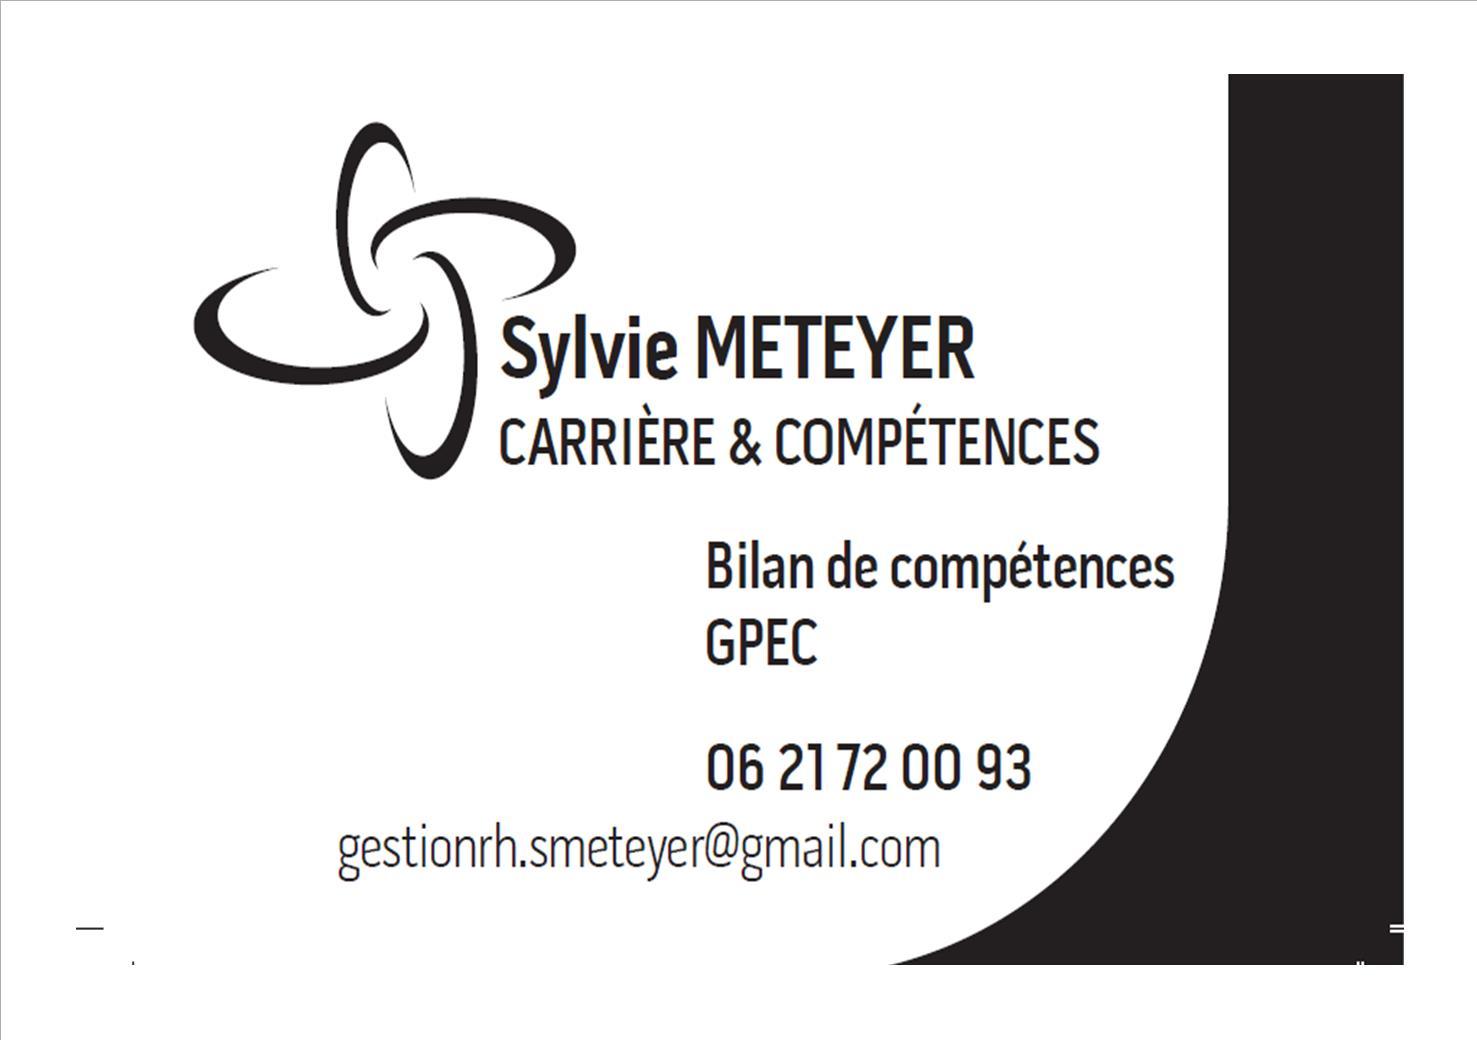 Sylvie Metayer carte pro.jpg